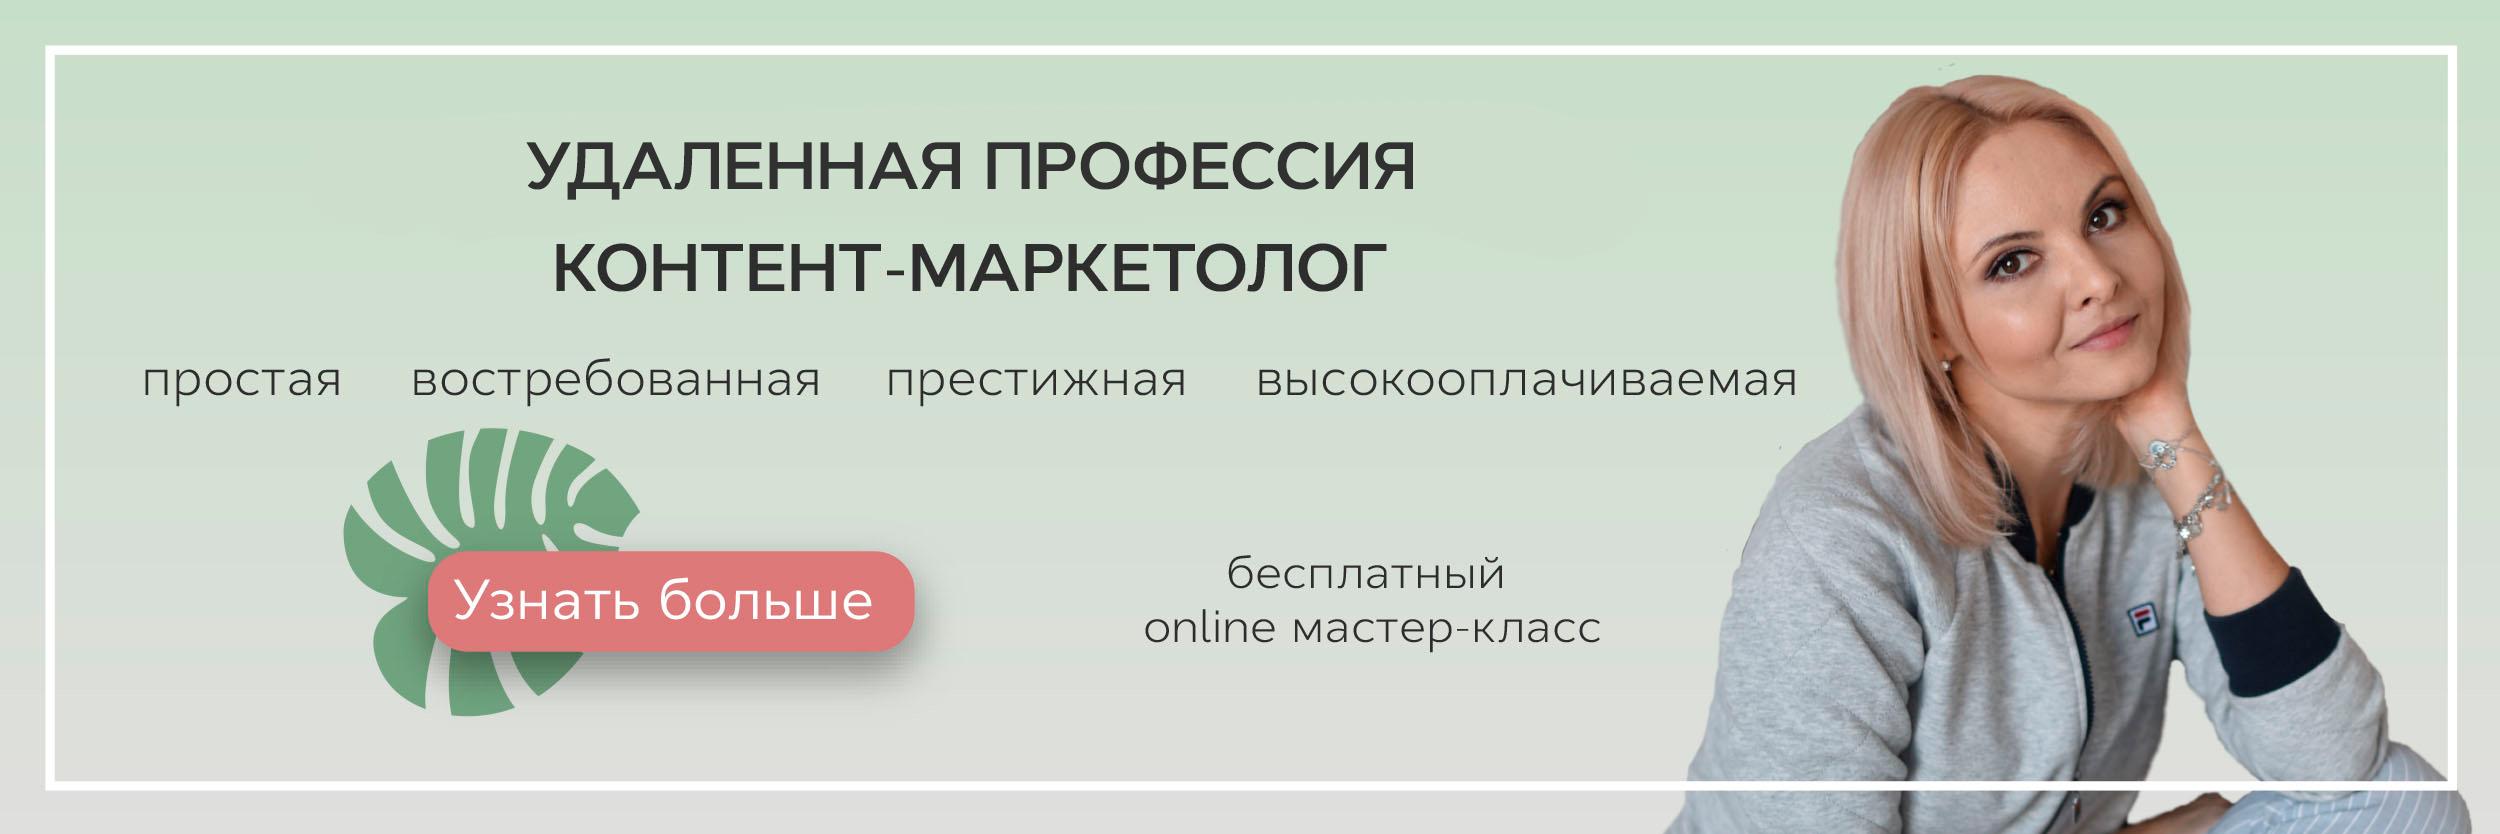 Удалённая профессия контент-маркетолог